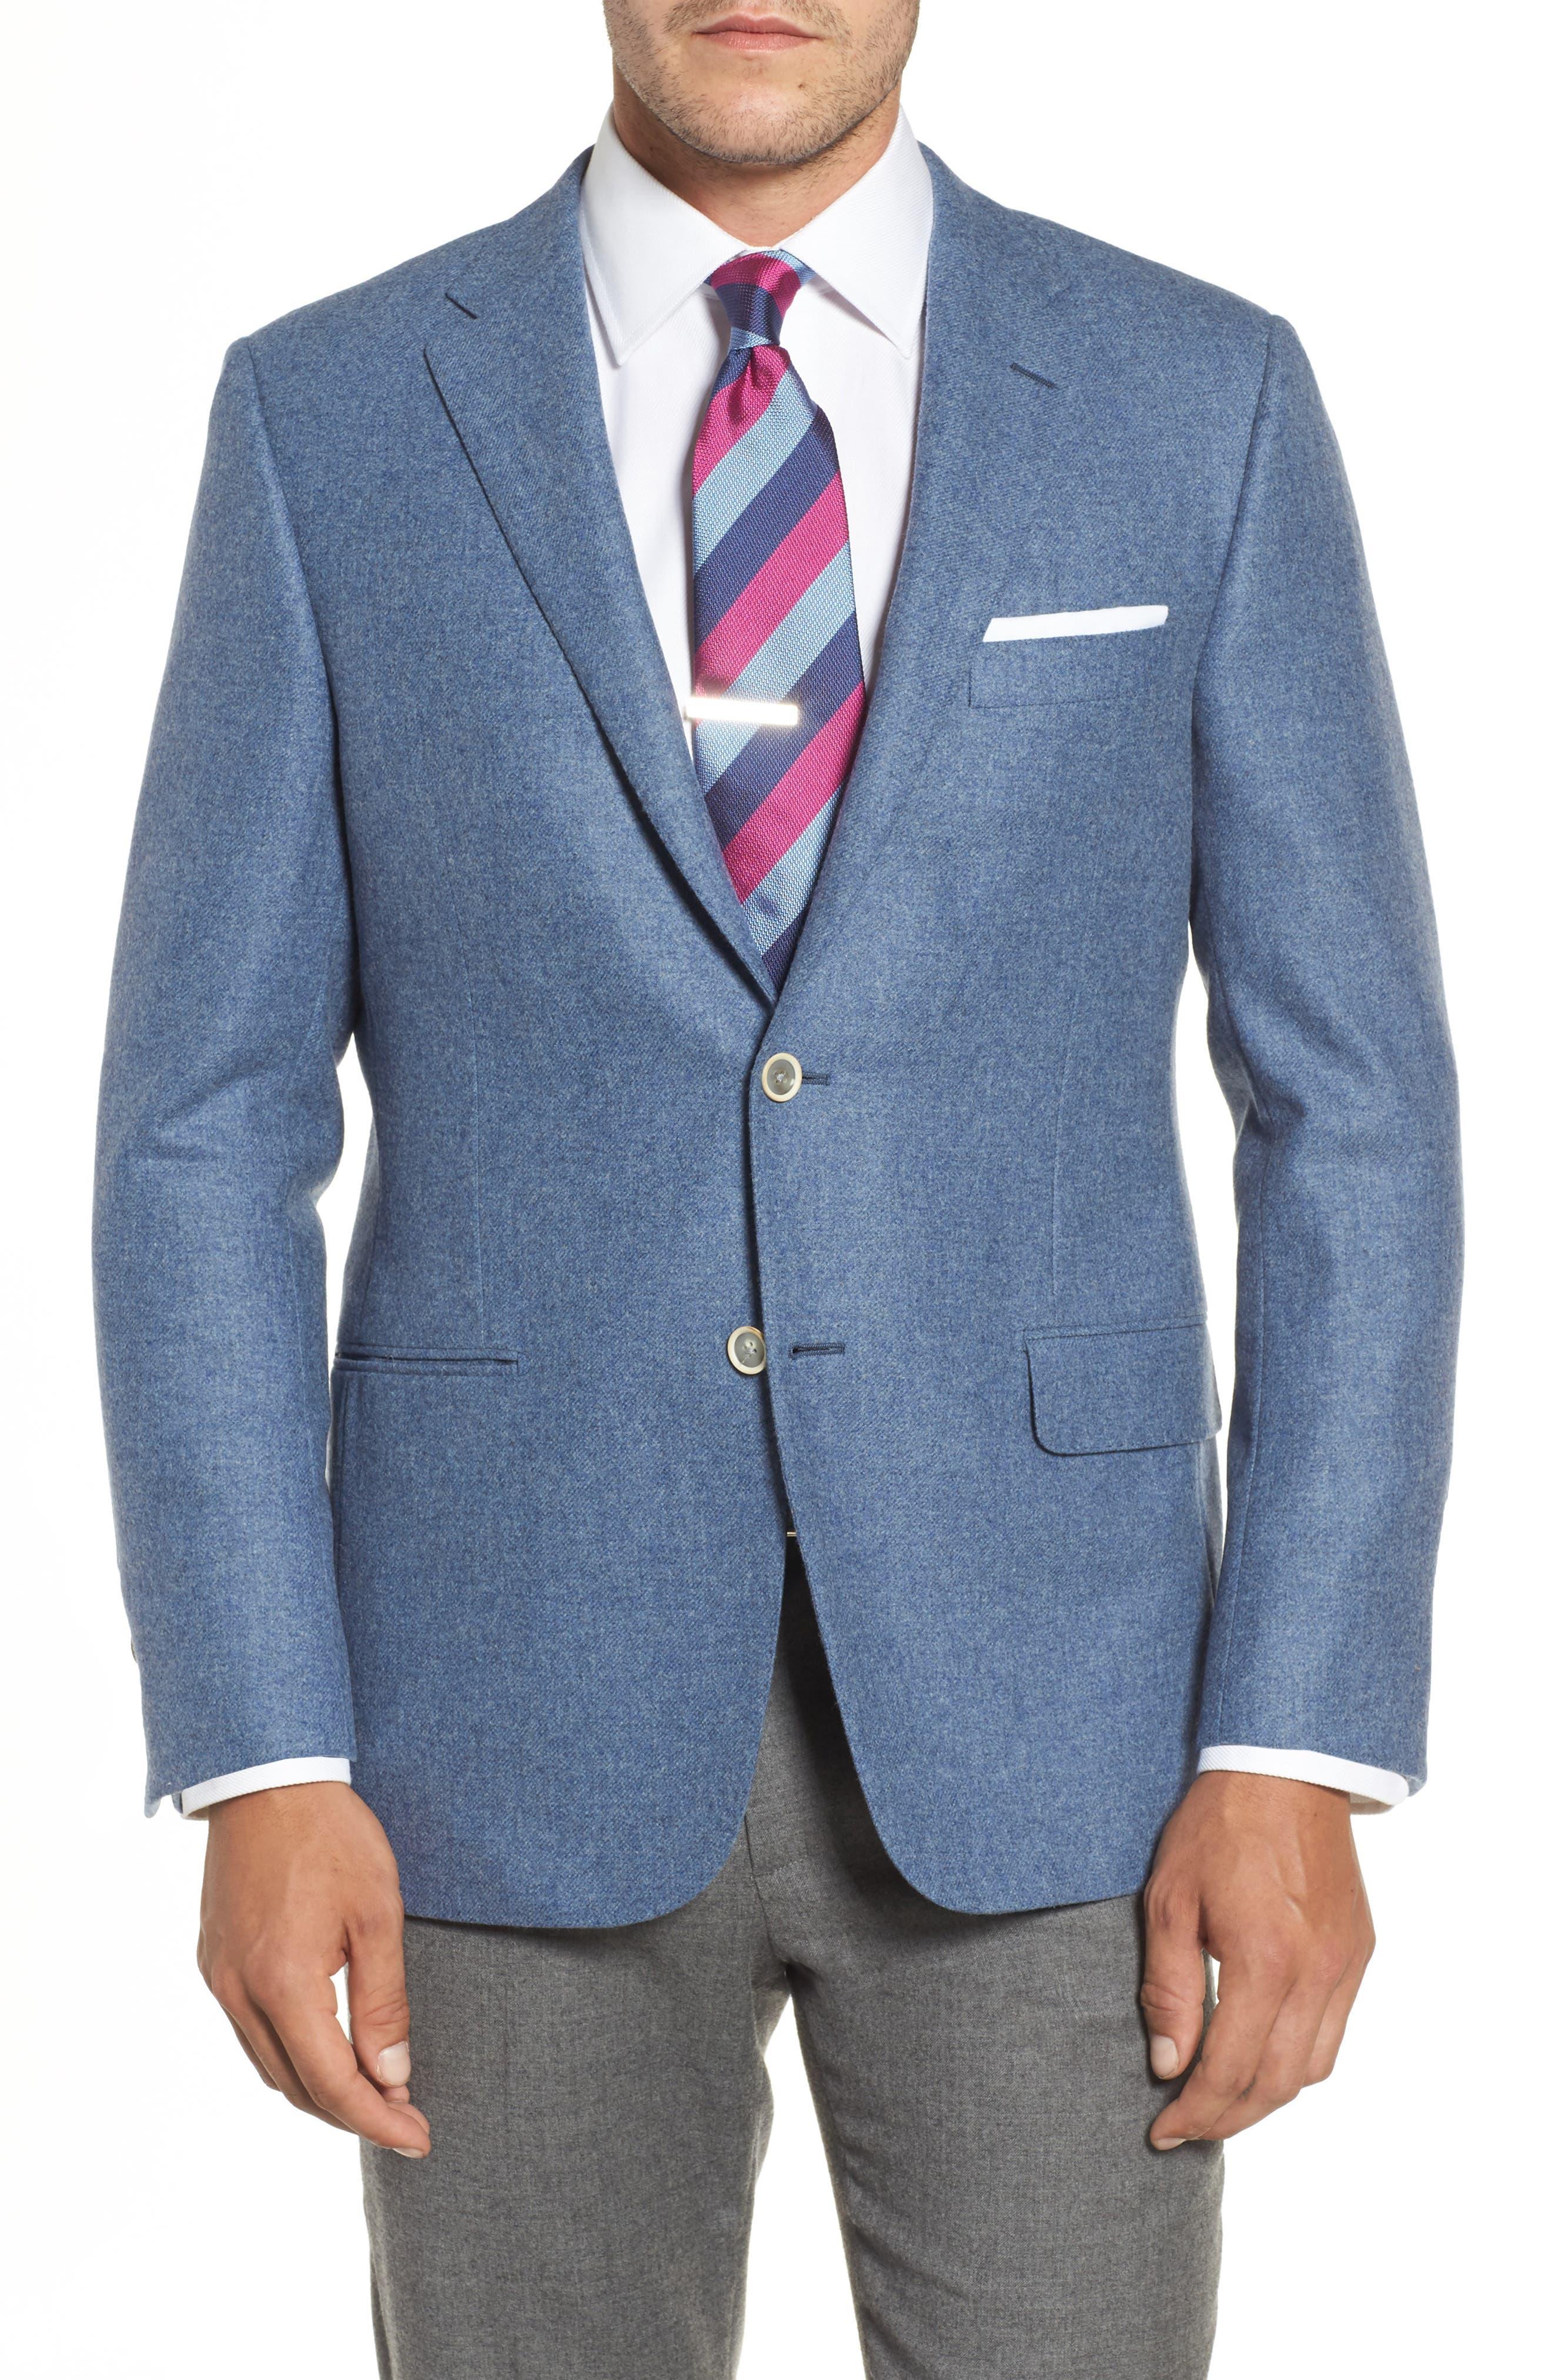 Hickey Freeman Beacon Classic Fit Wool & Cashmere Blazer